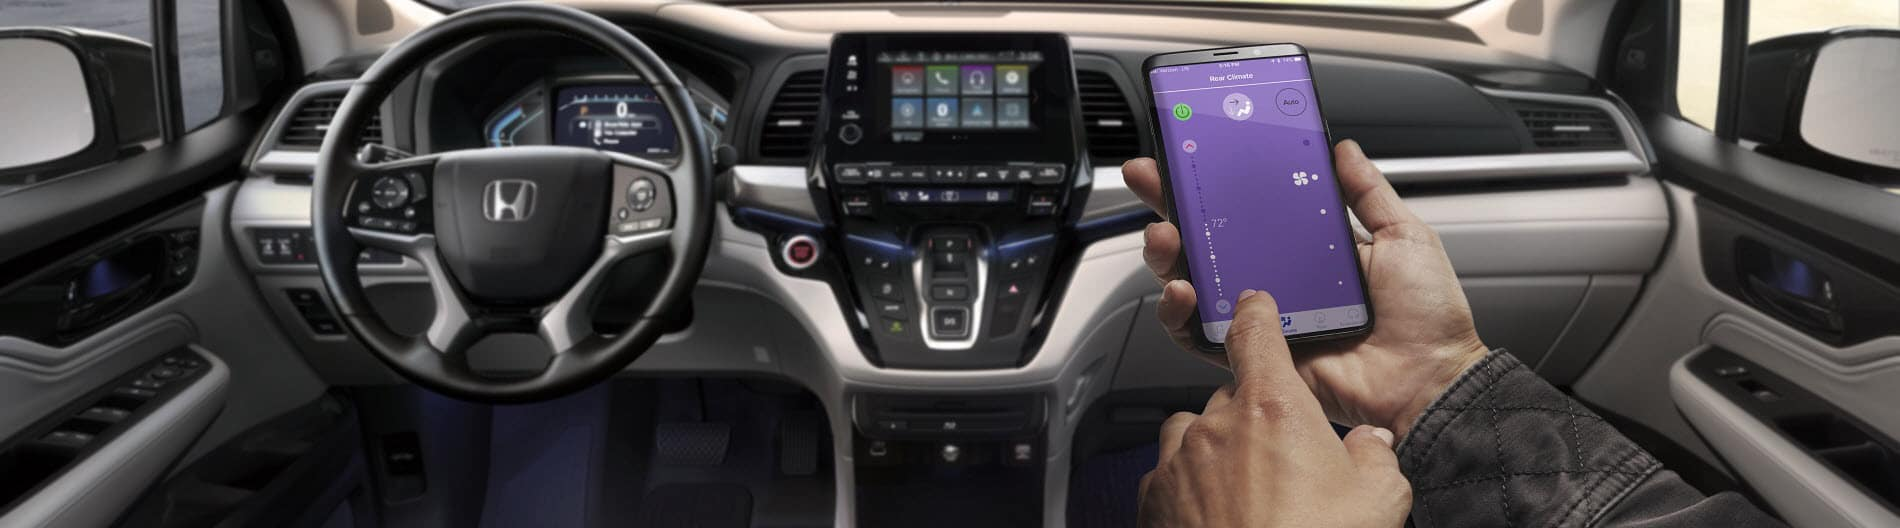 2021 Honda Odyssey Interior Dashboard